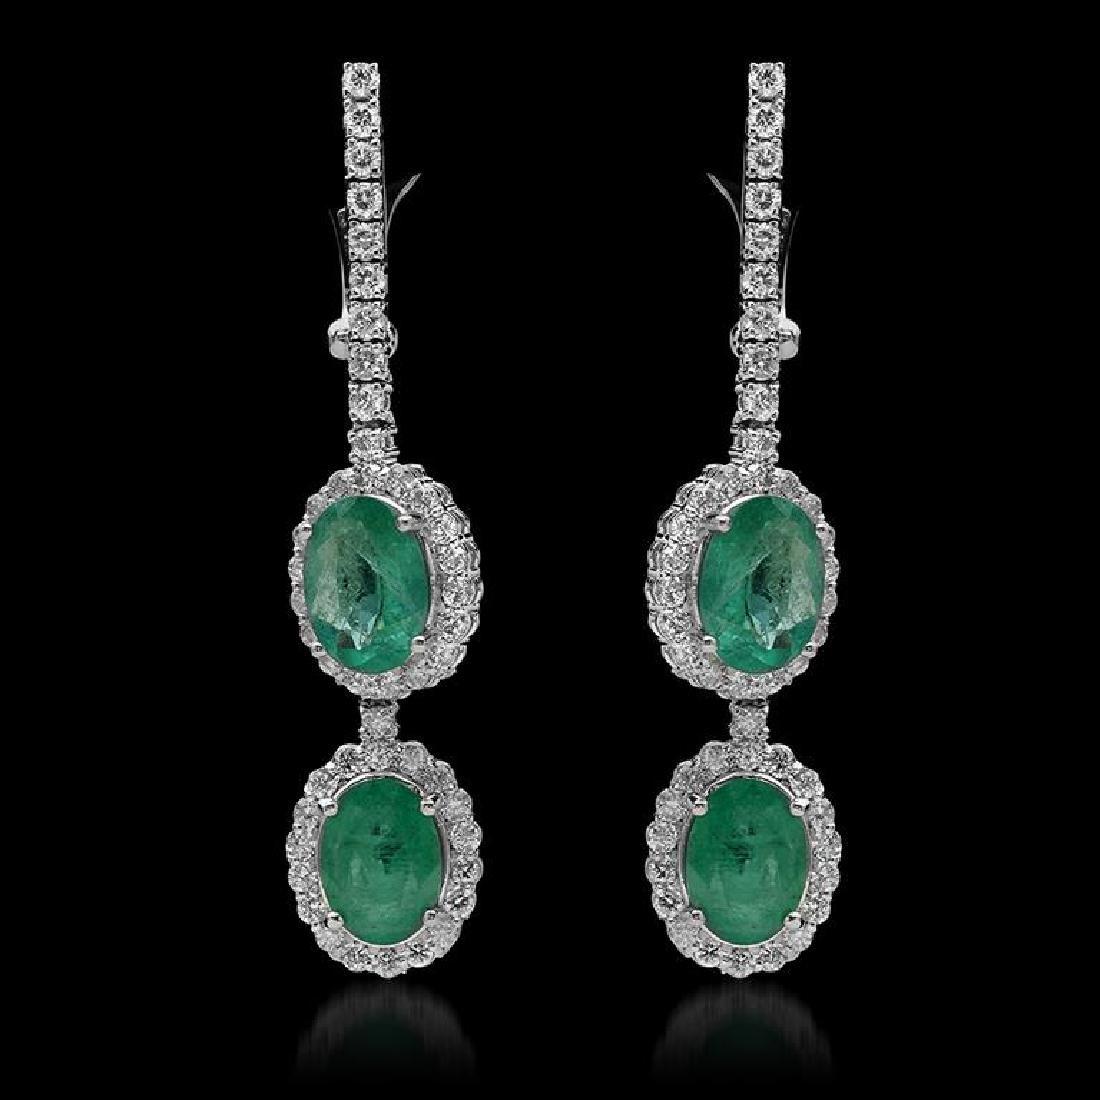 14K Gold 5.08ct Emerald & 1.97ct Diamond Earrings